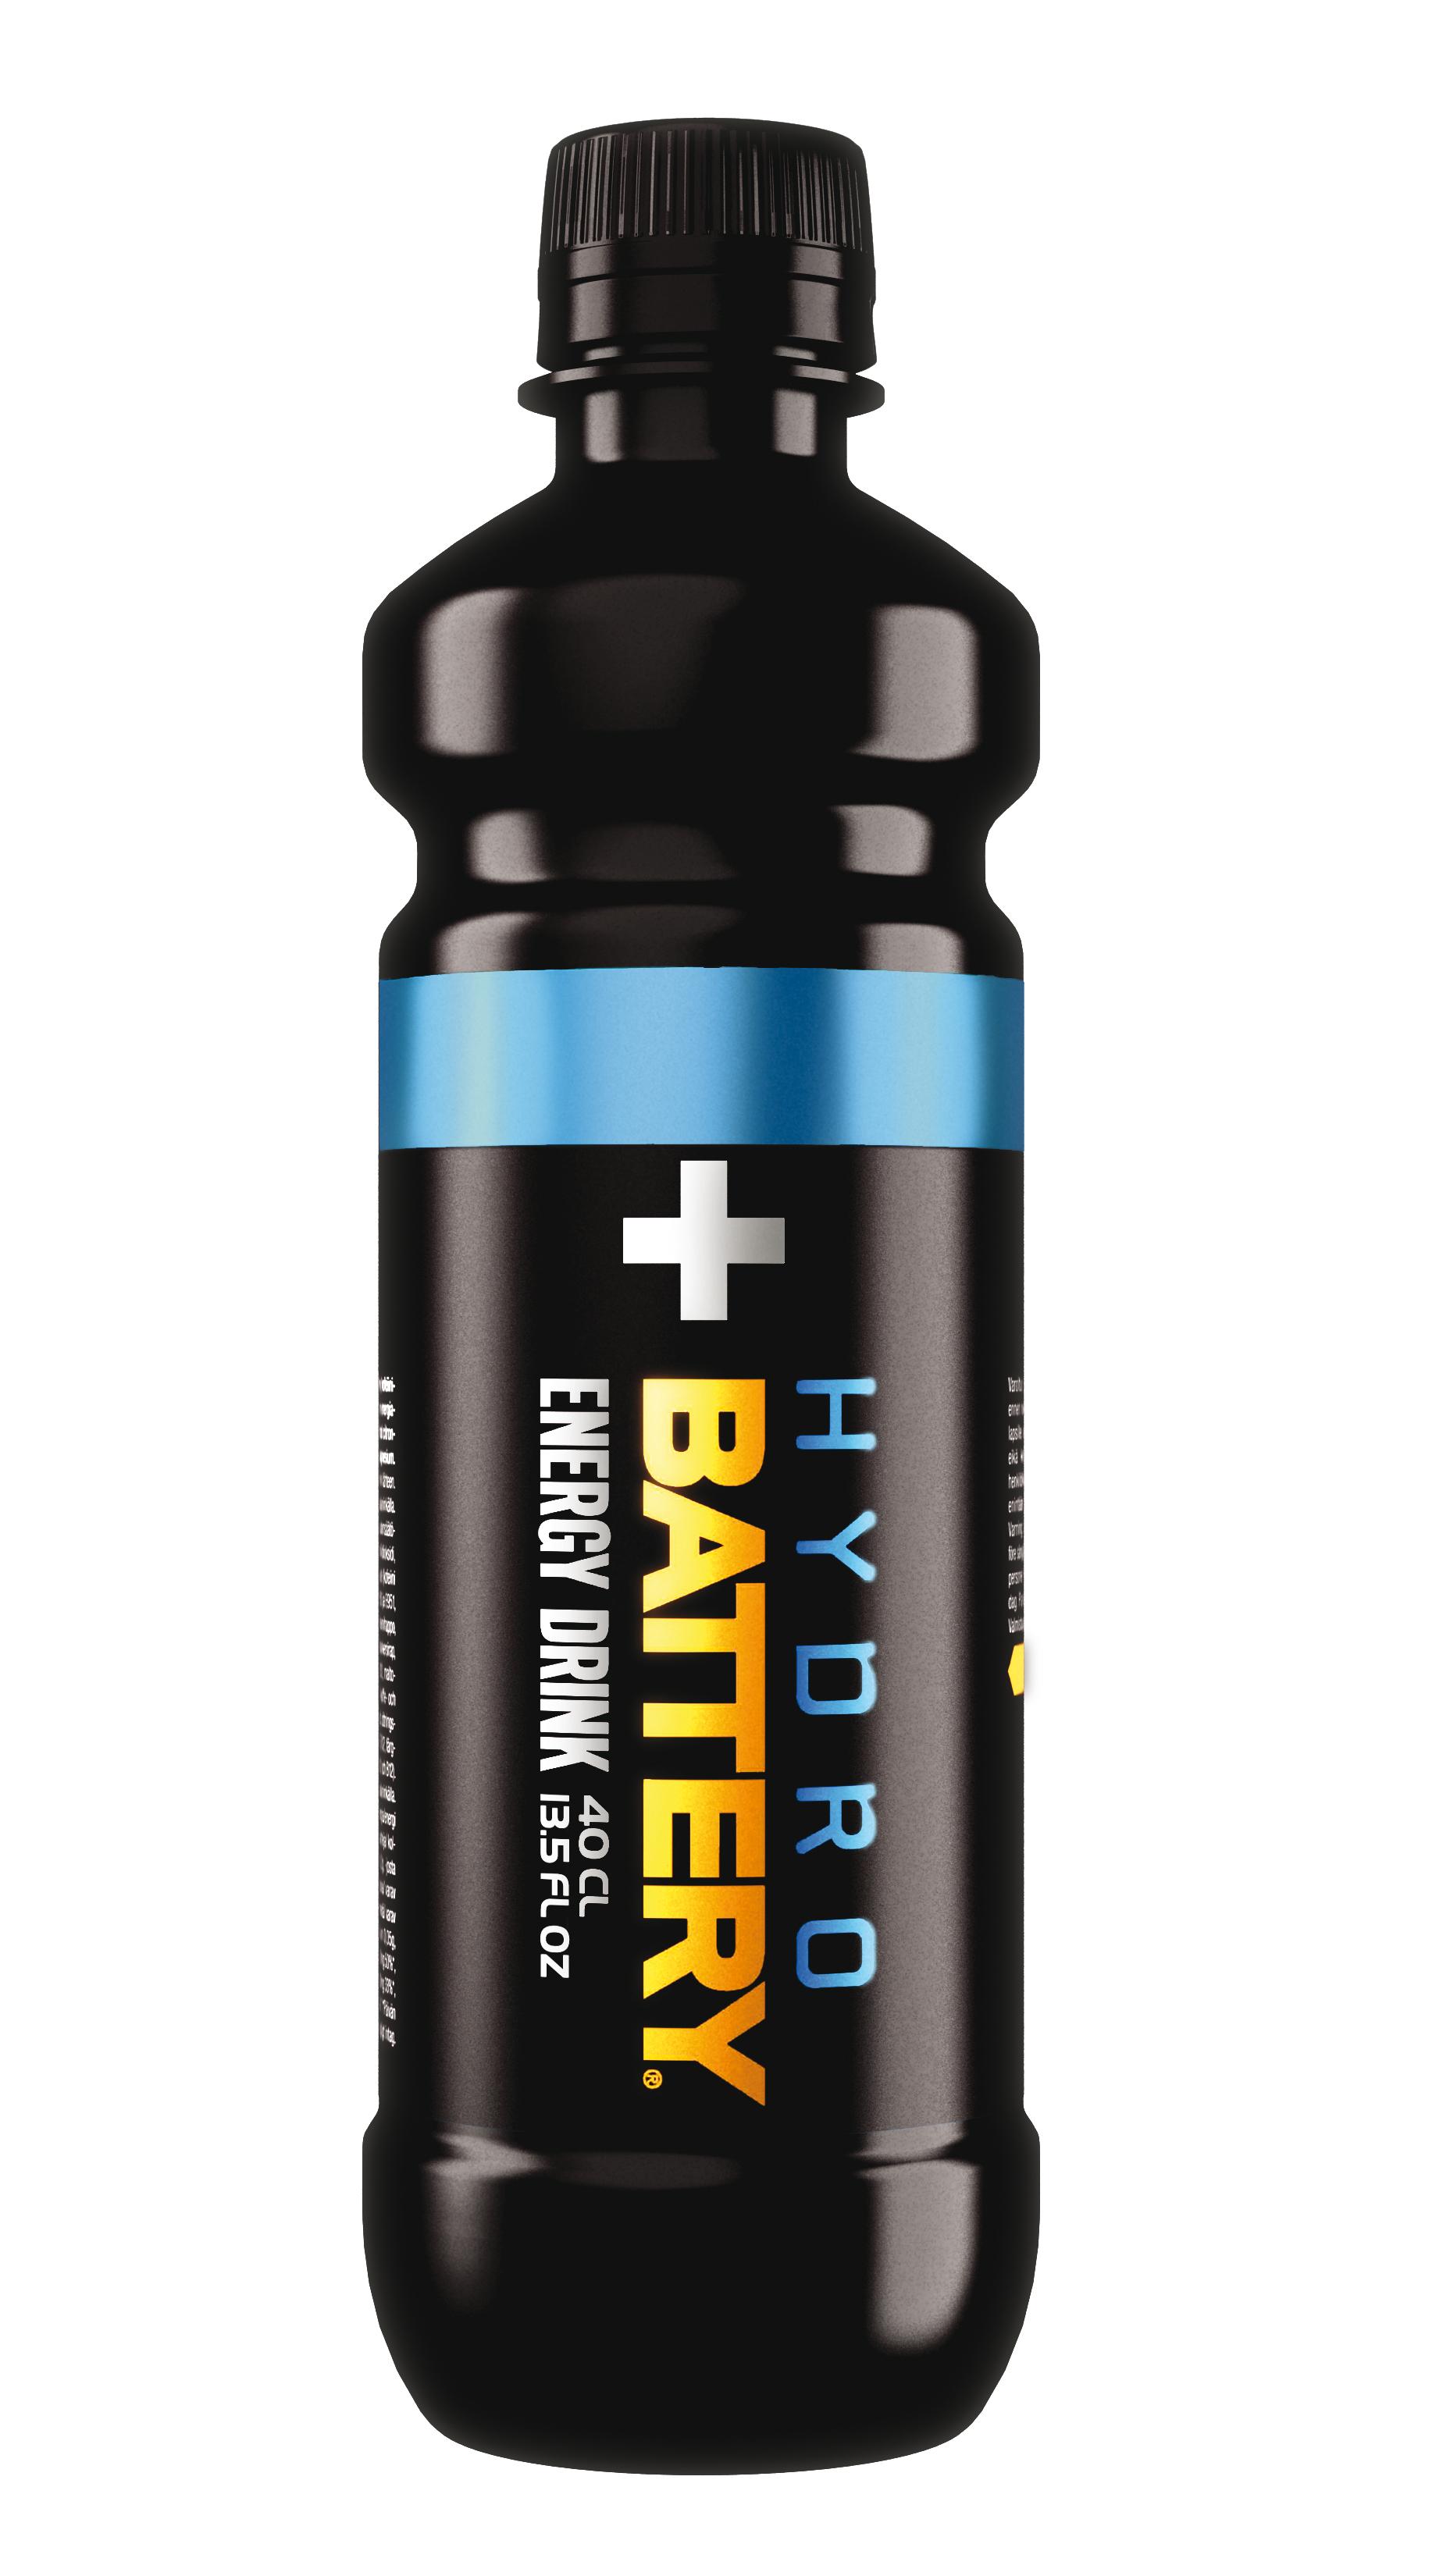 Battery hydro